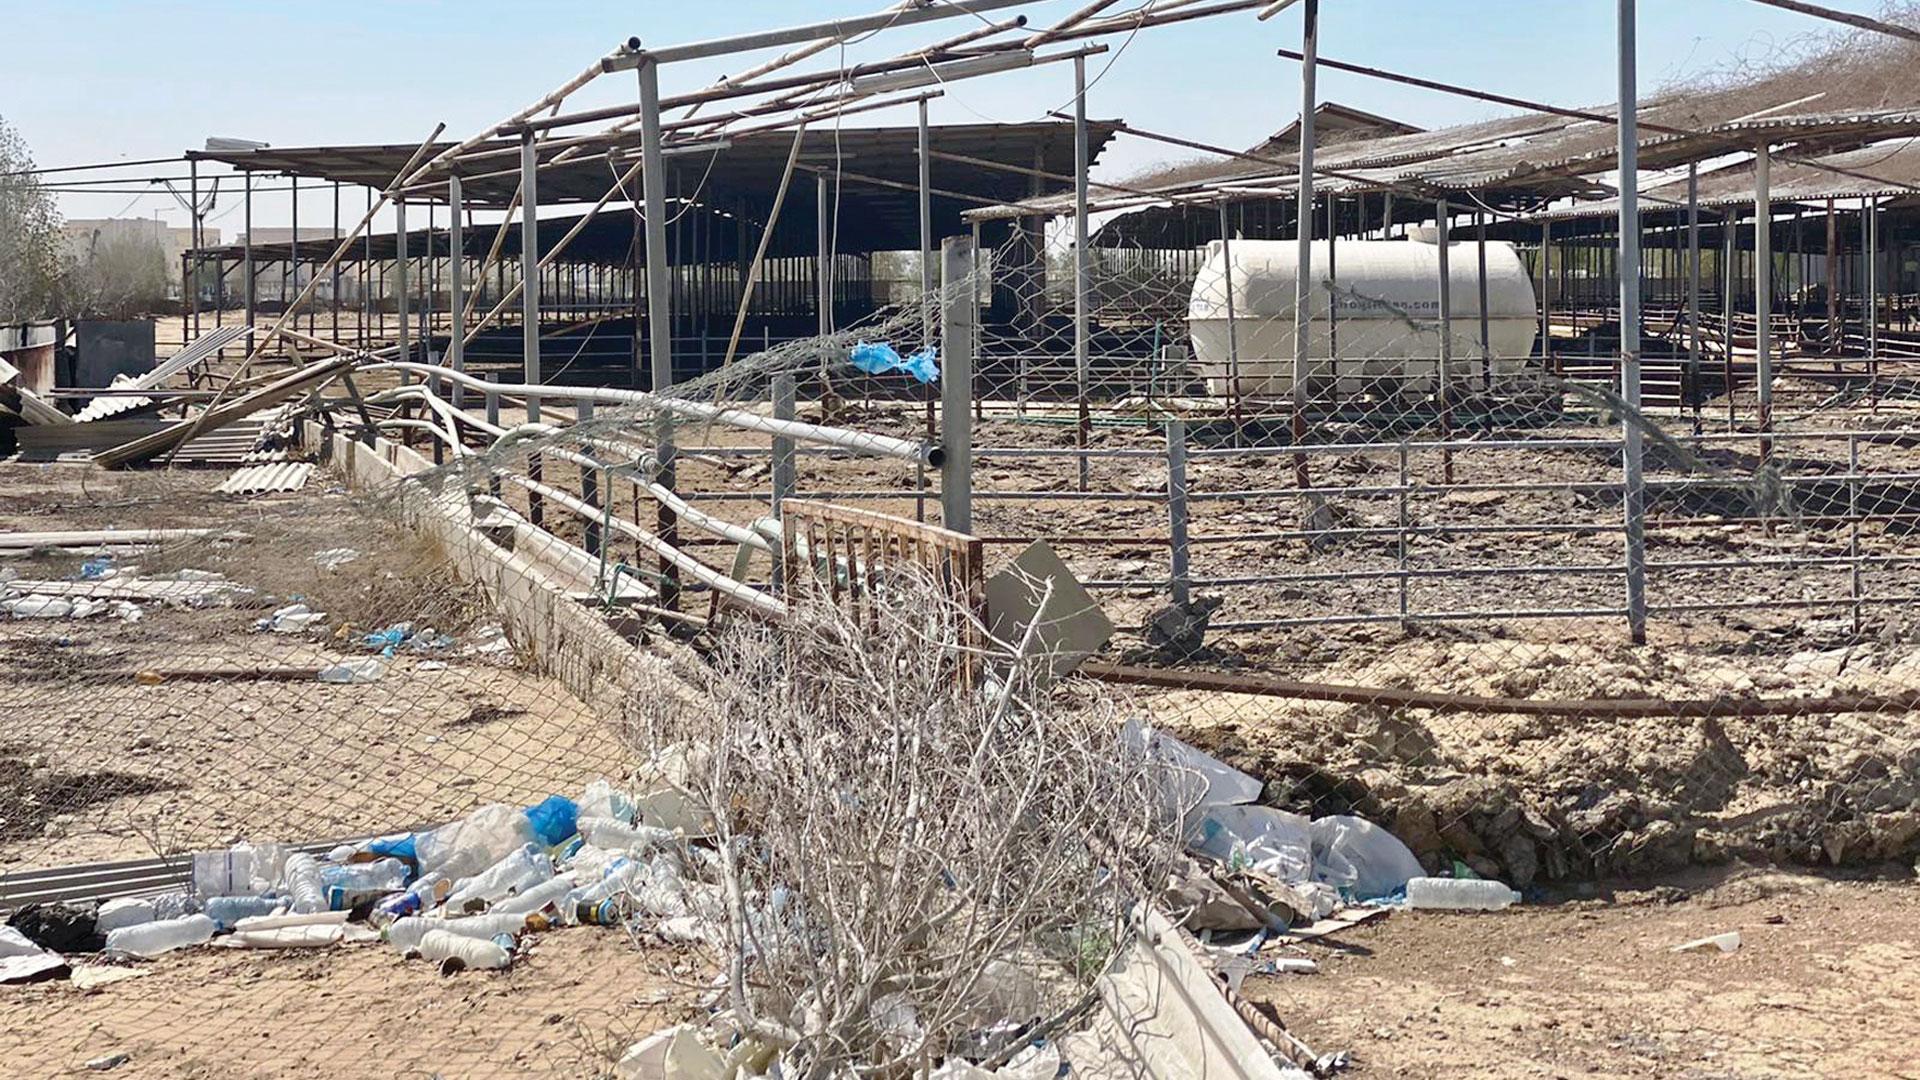 Abu Hamour Market Awaits Development